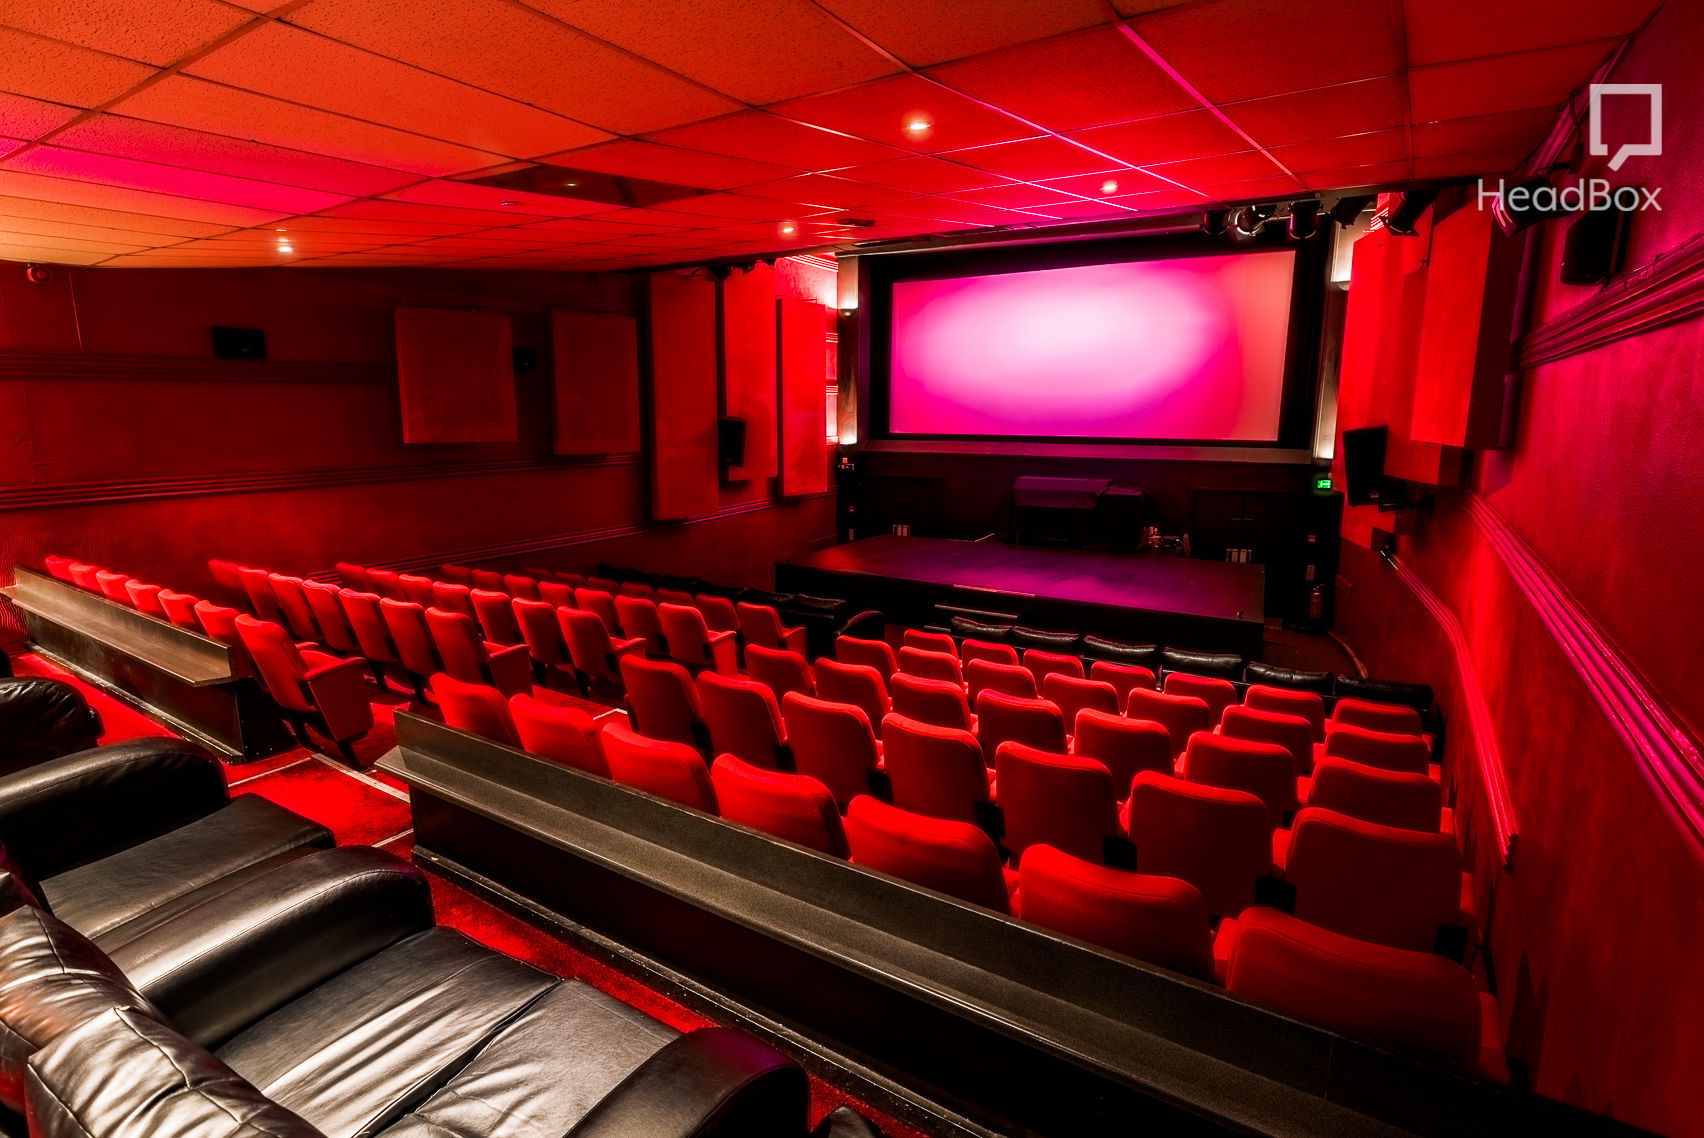 floor seating sofa uk measurements of a bed book screen one, the electric cinema (birmingham) – headbox